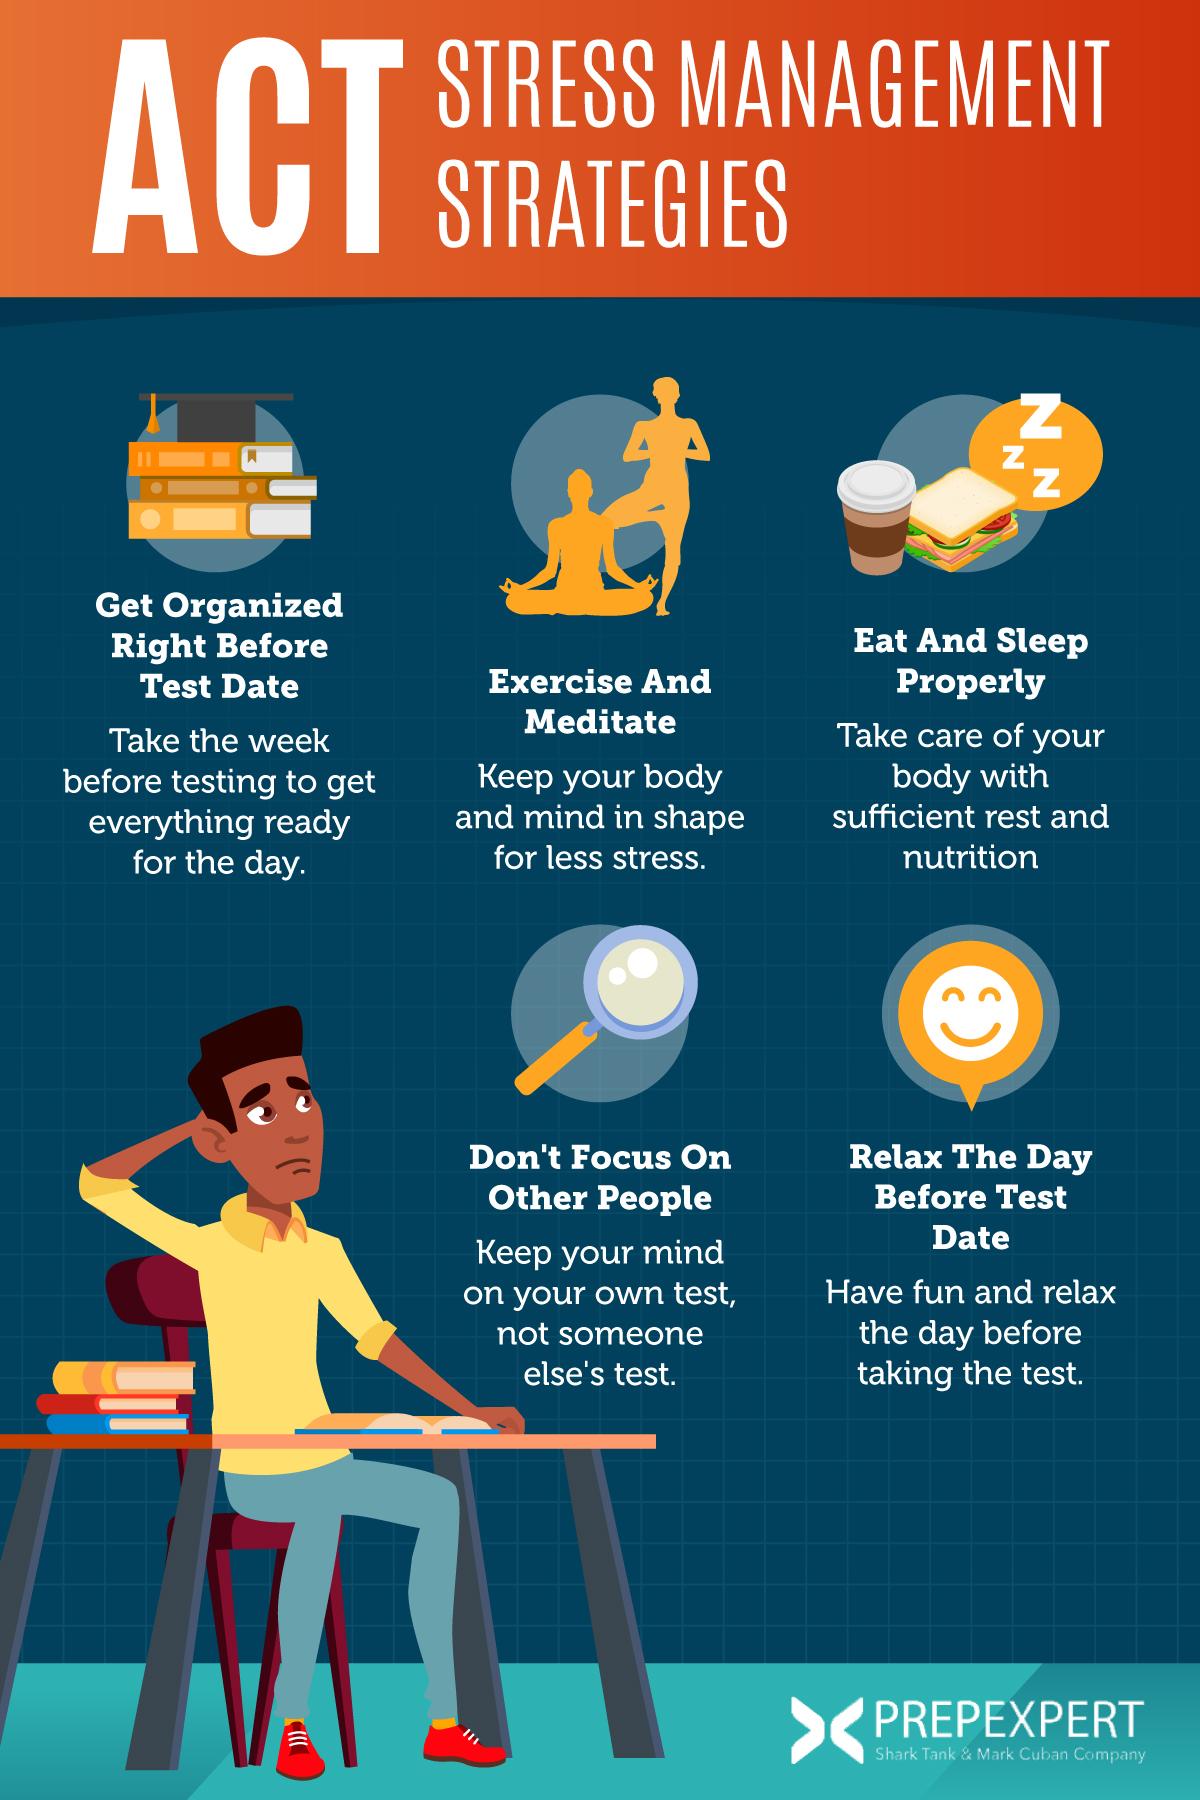 5 ACT Stress Management Strategies | Prep Expert